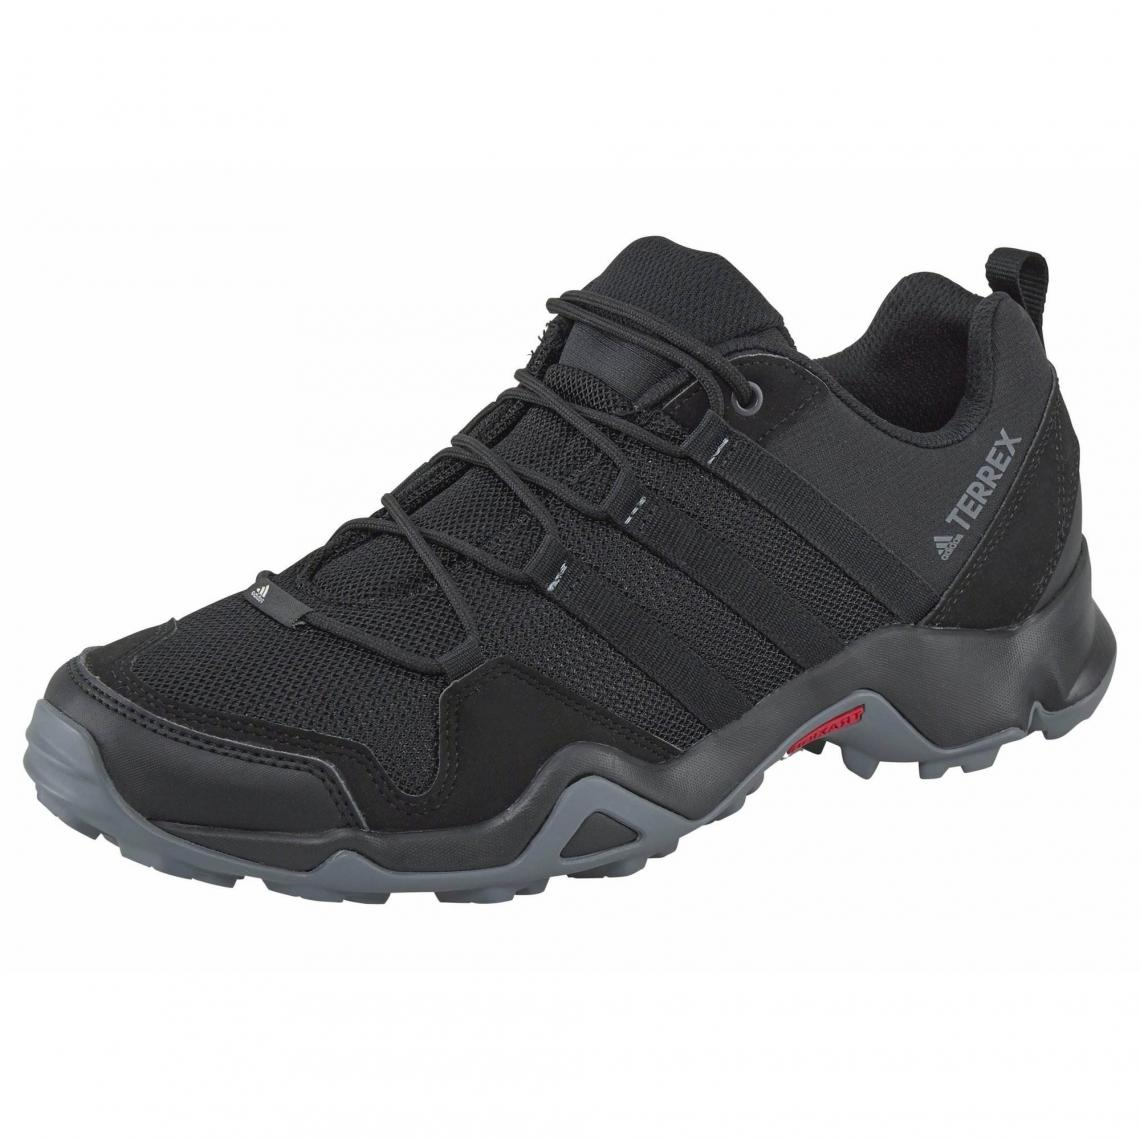 42c188dd769 adidas Performance Terrex AX2R chaussures de randonnée homme - Noir Adidas  Performance Homme